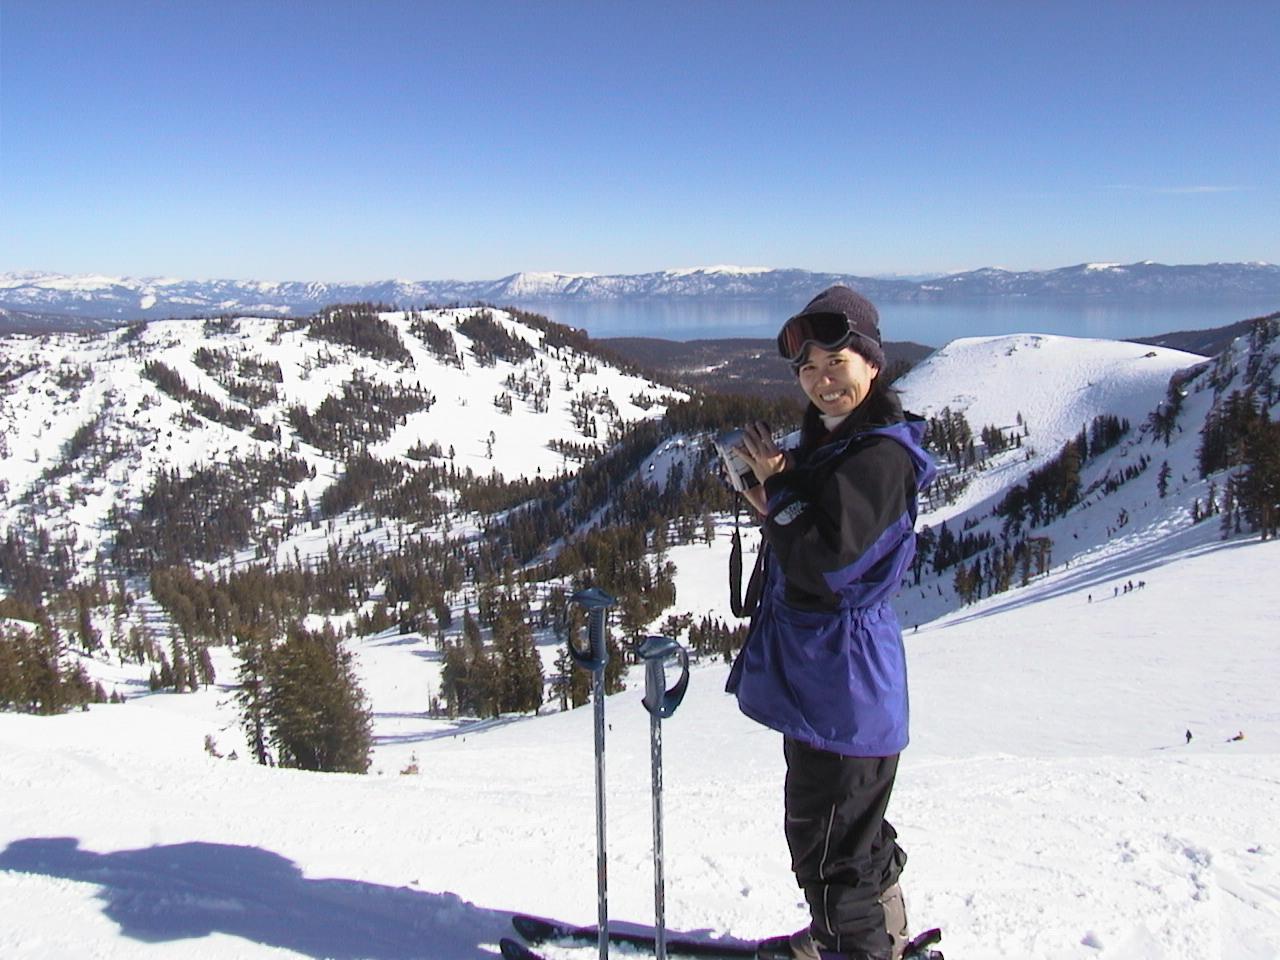 alpine meadows, california - ski north america's top 100 resorts